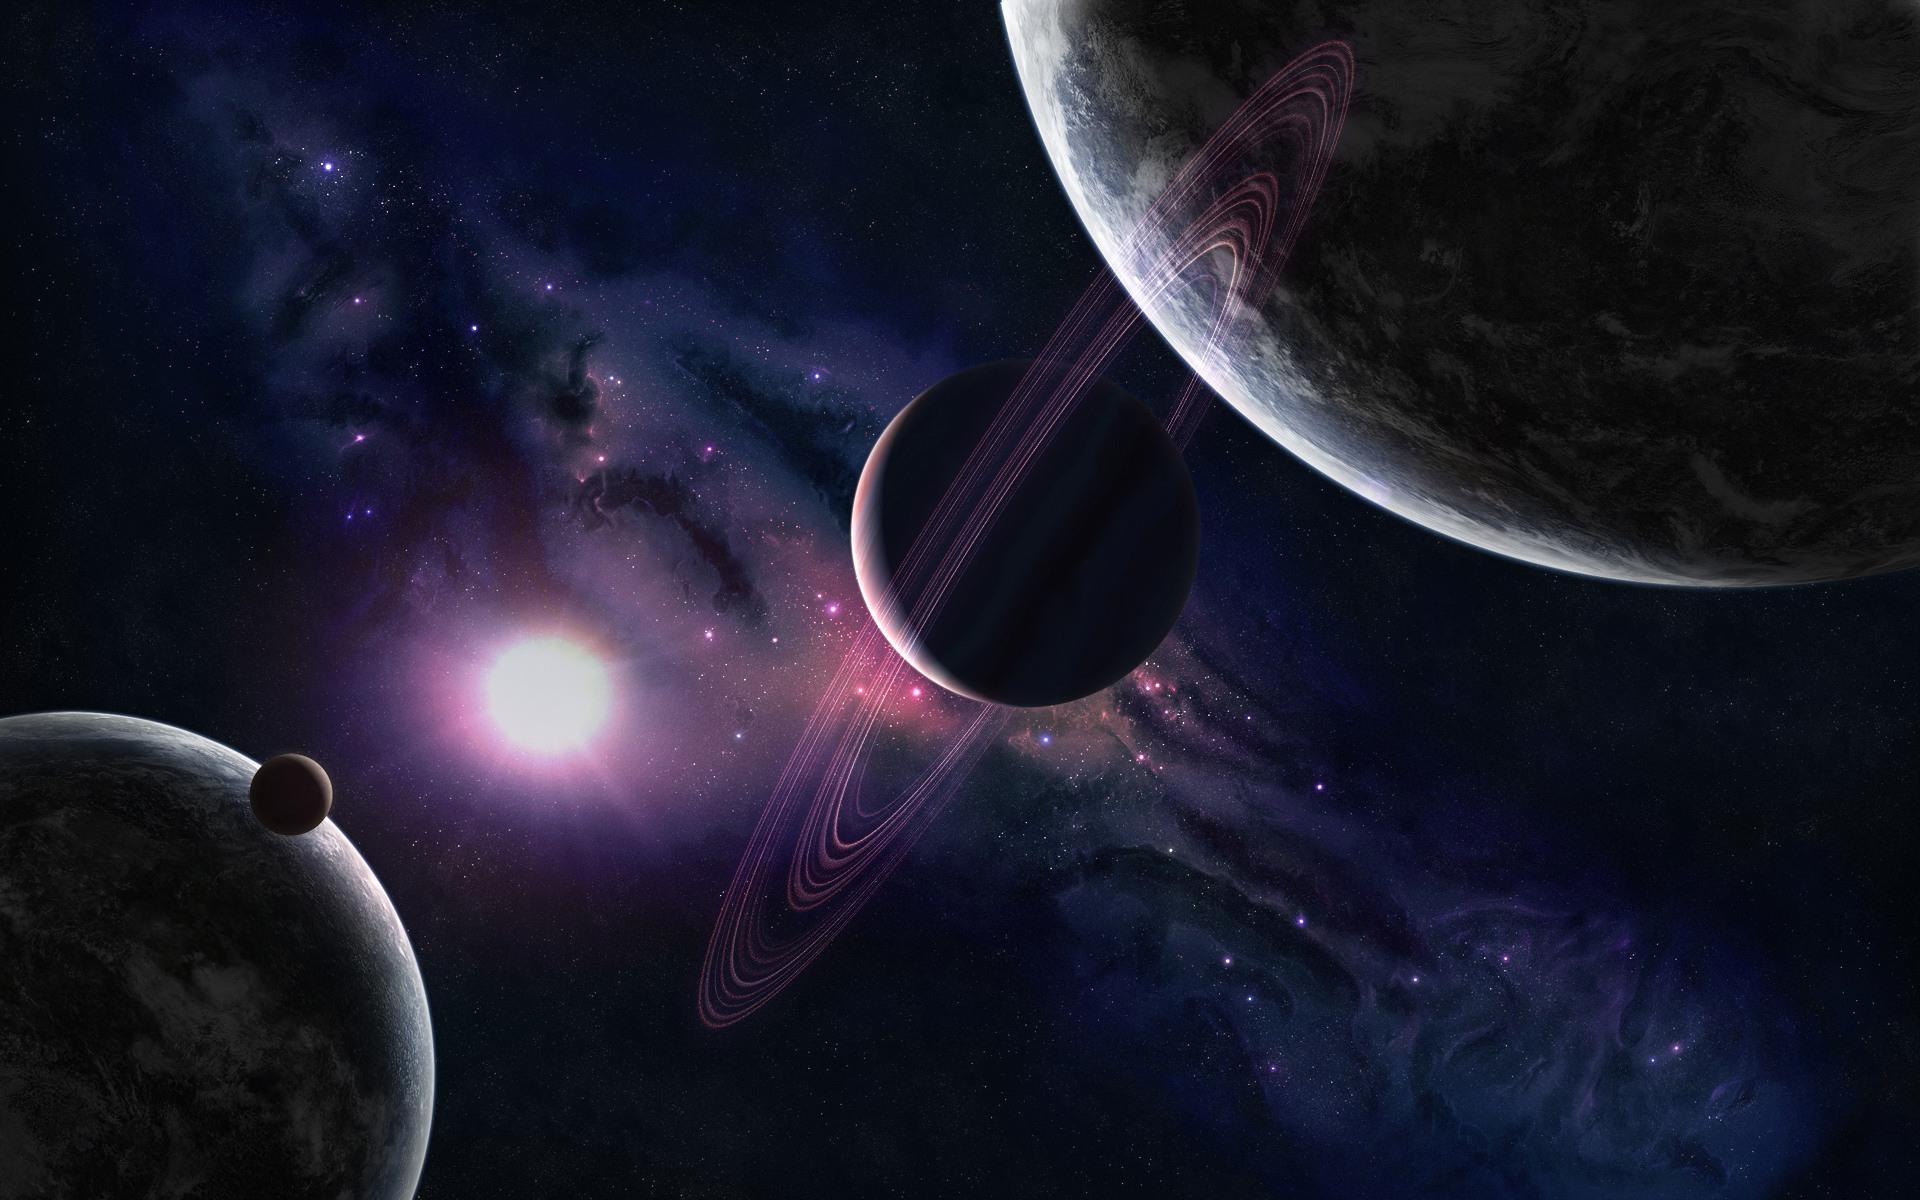 Ringed Planet desktop wallpaper 1920x1200